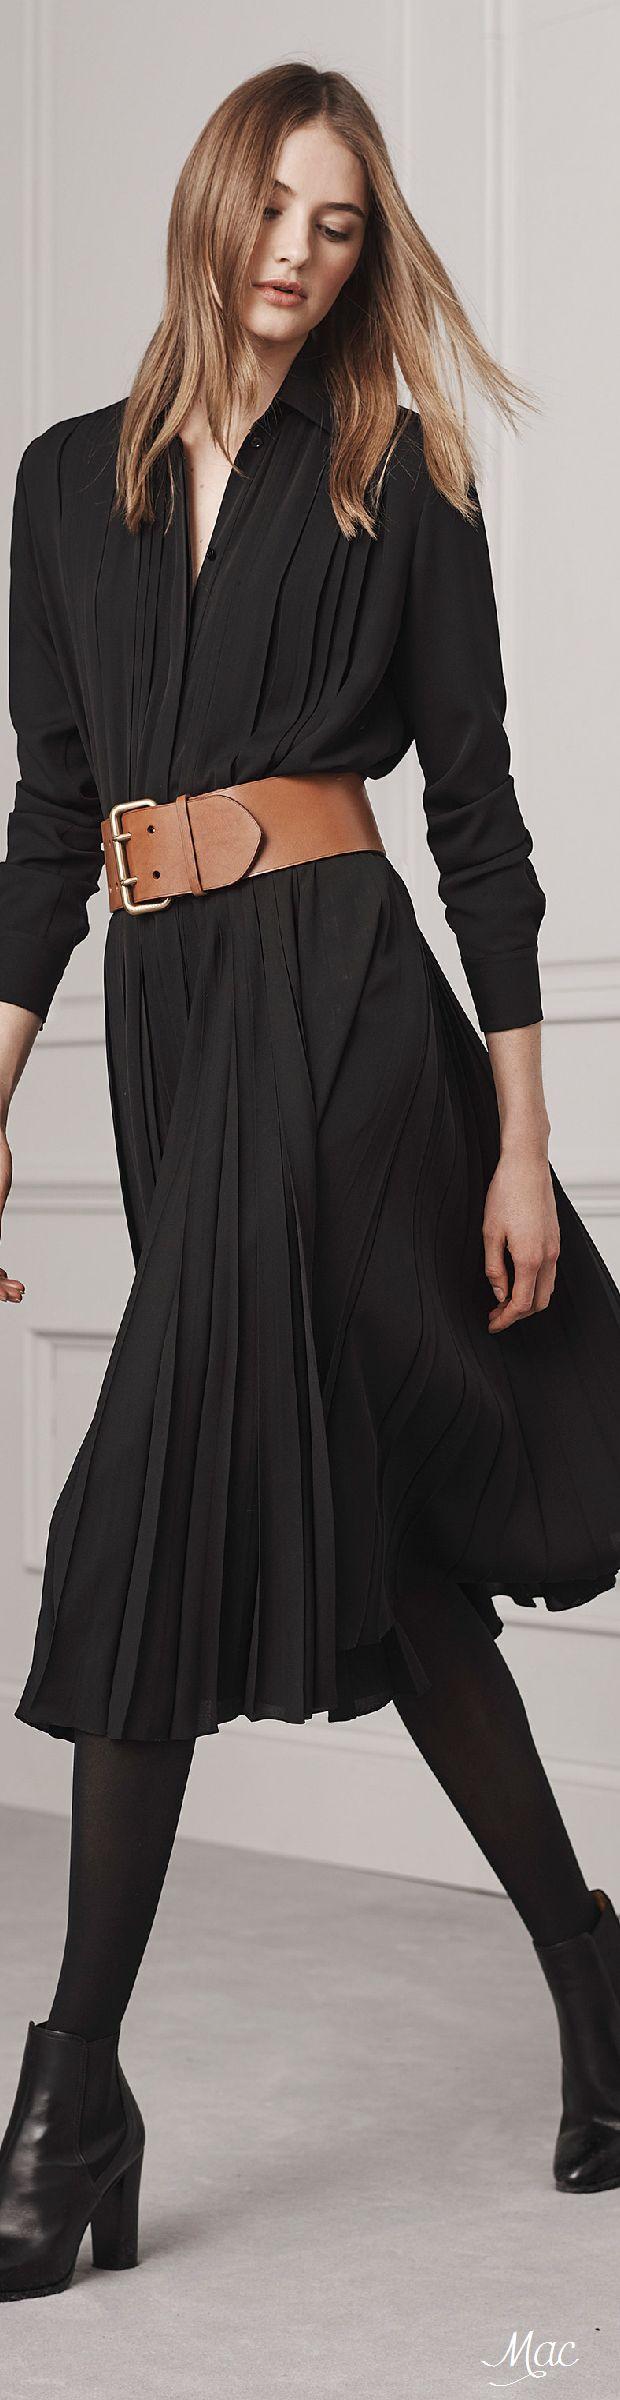 Pre-Fall 2016 Ralph Lauren Women's Belts - http://amzn.to/2id8d5j